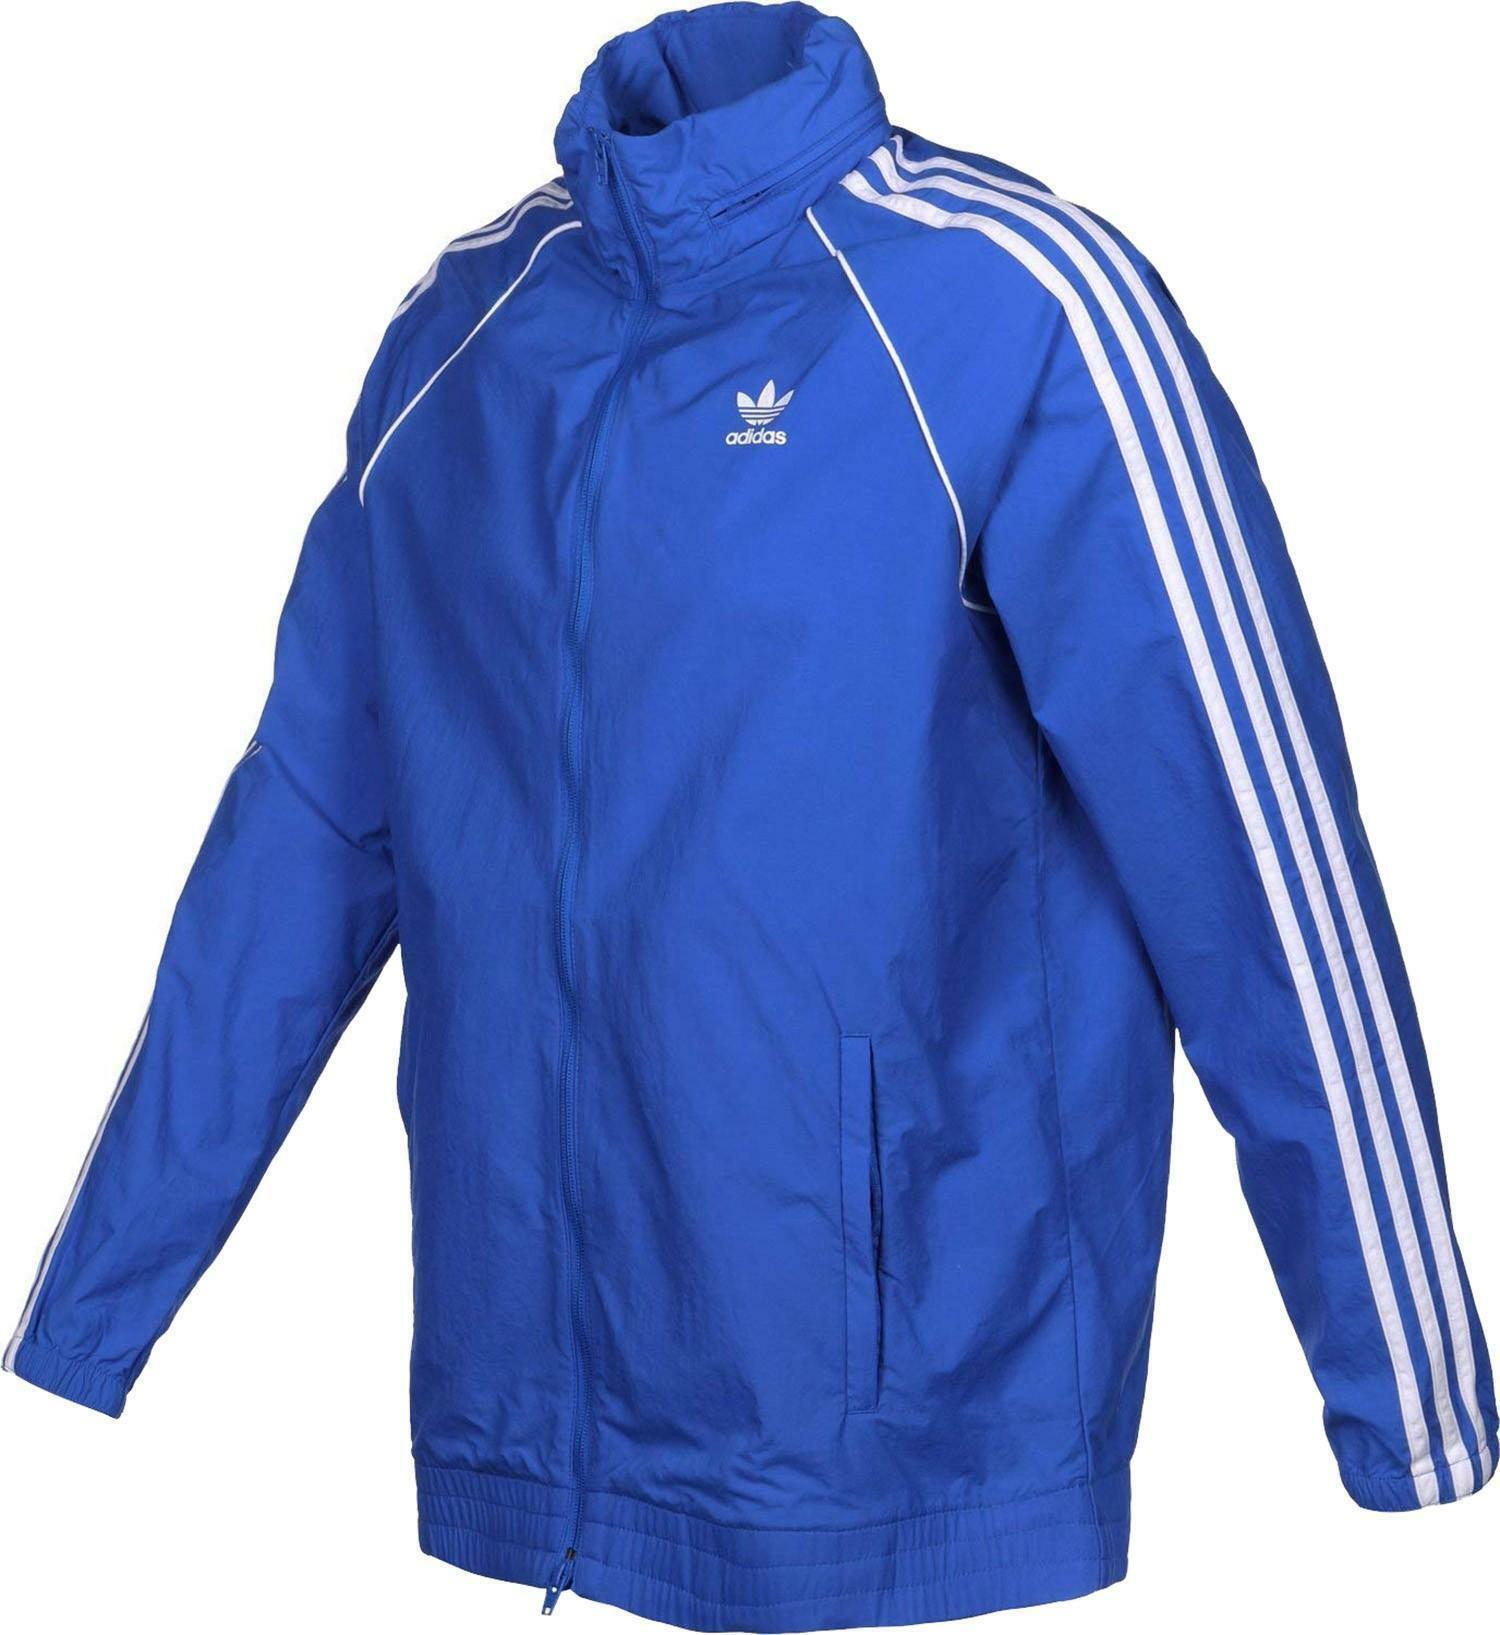 adidas originals adidas sst windbreaker giacca a vento uomo azzurra dh5835